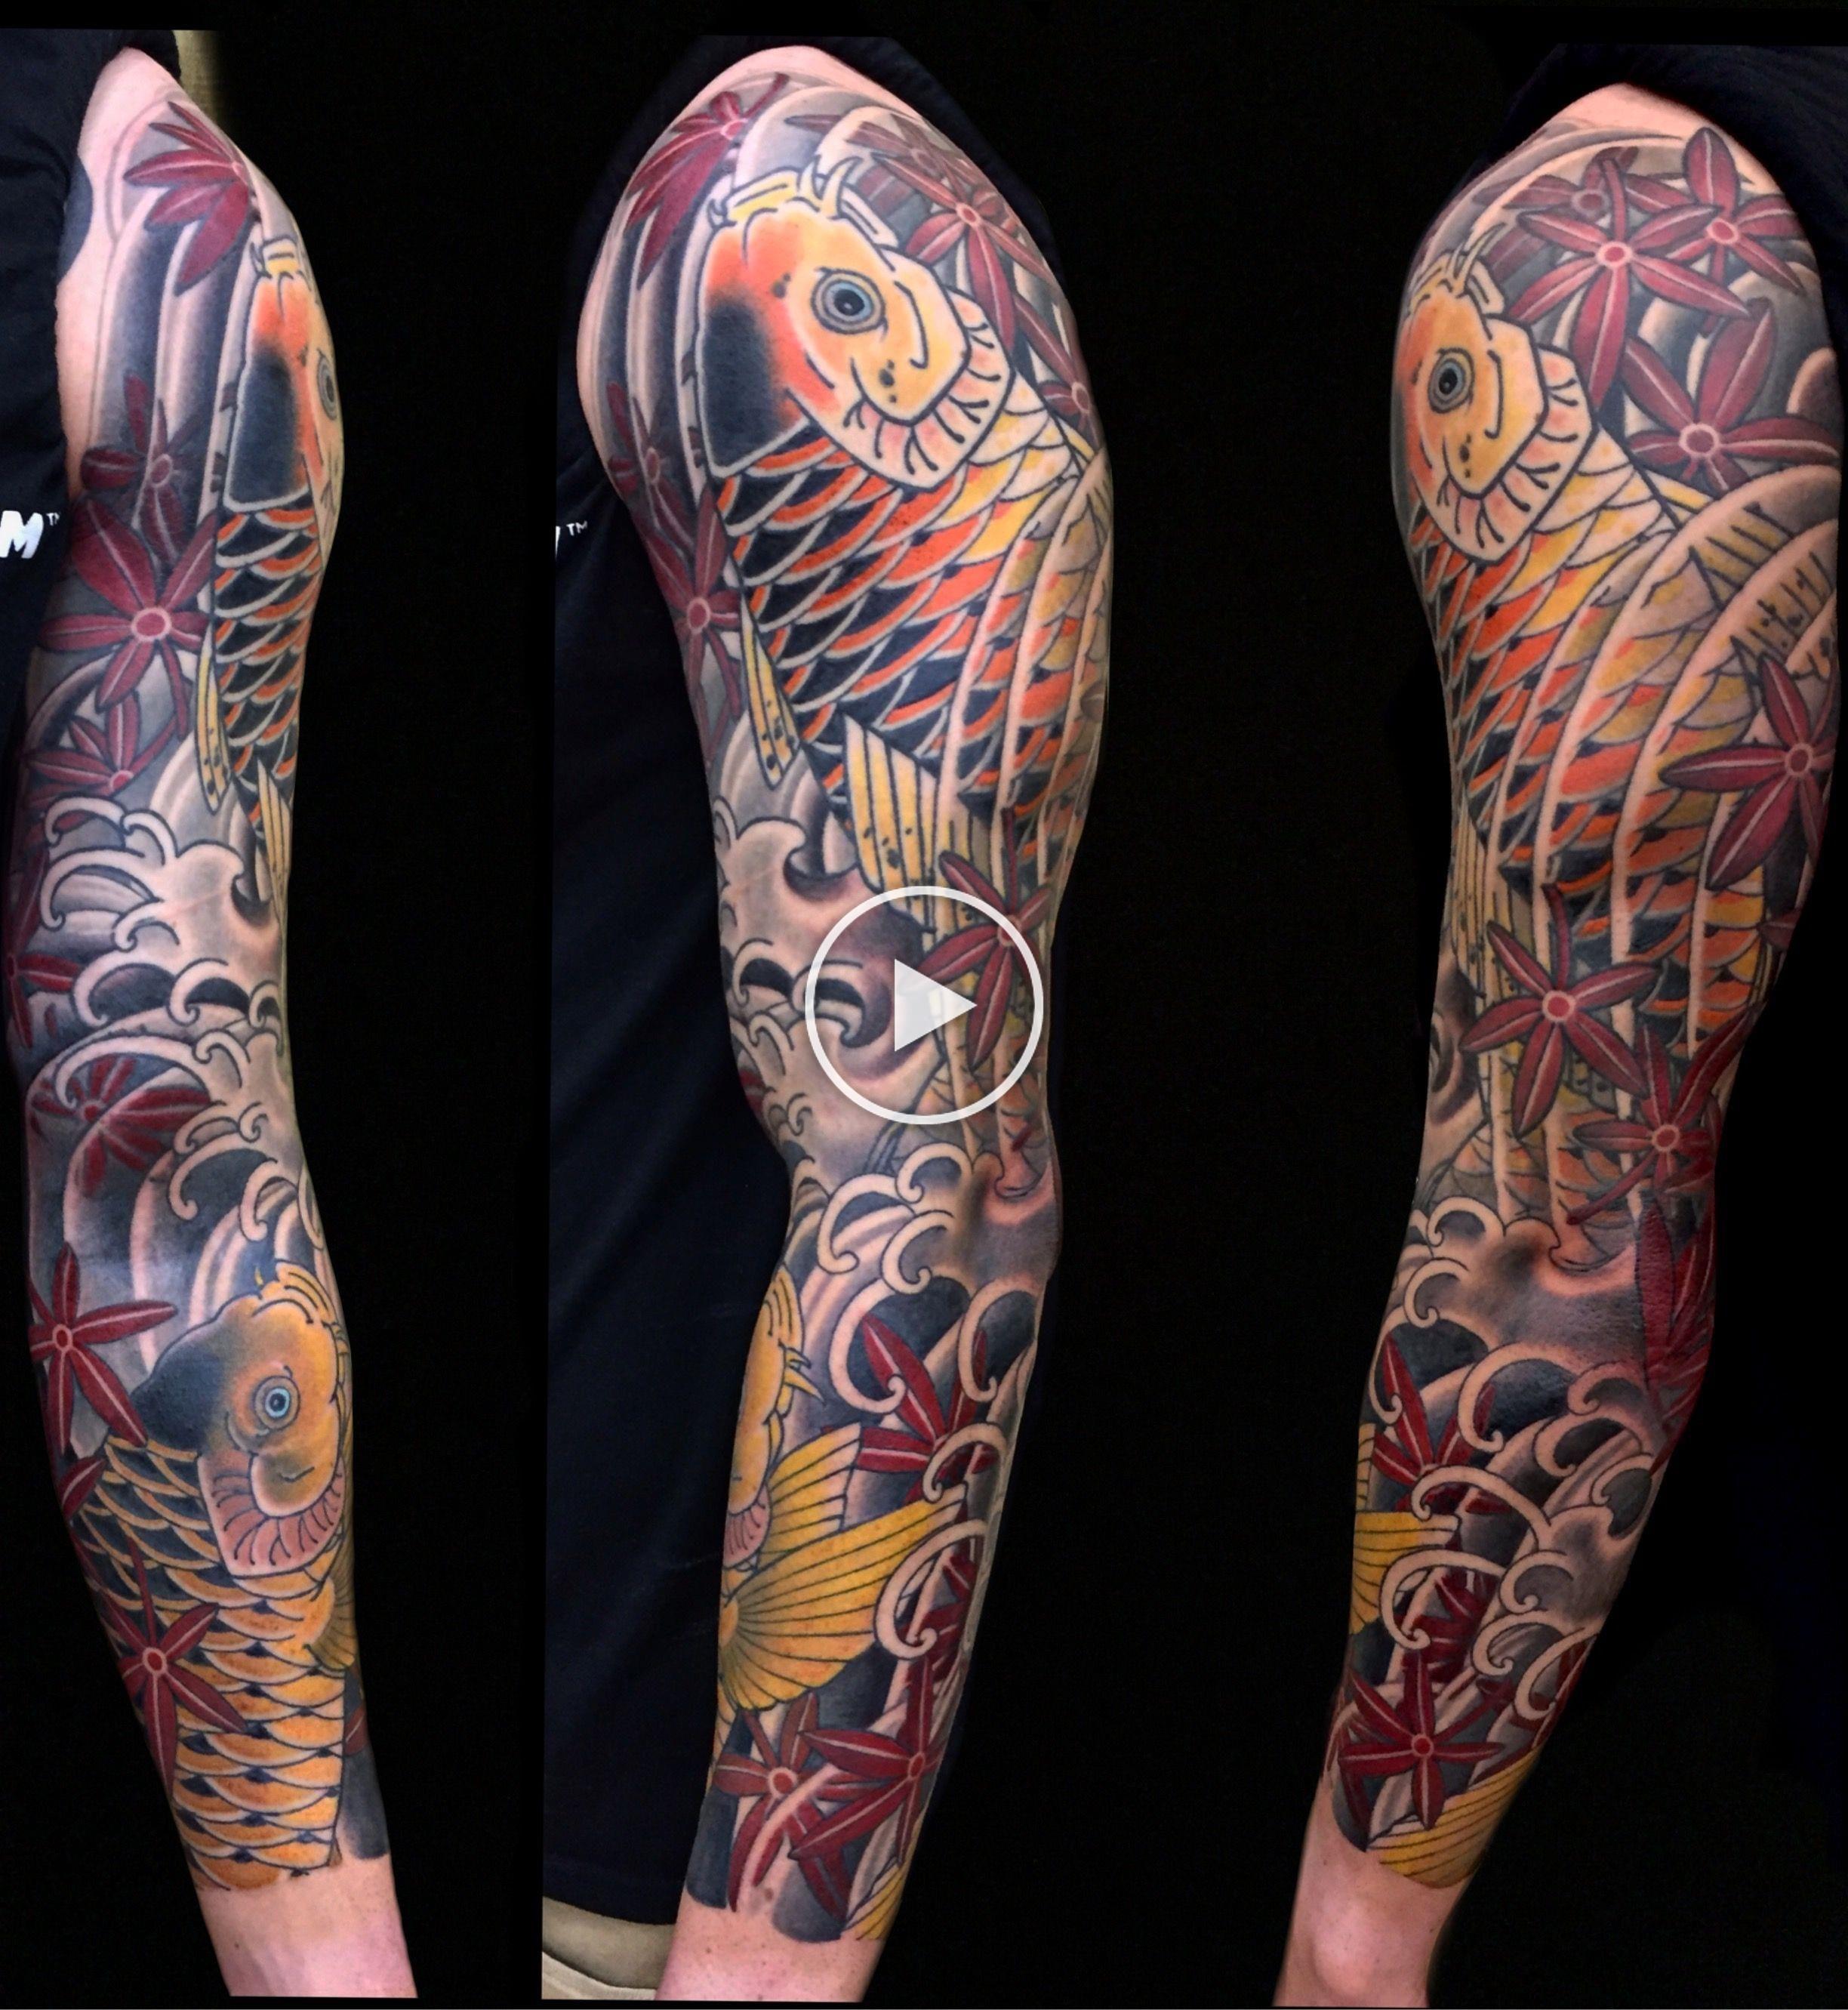 Koi Sleeve With Maple Leaves Japanese Style Tattoos By Cindy Maxwell Seventh Son Tattoo San Francisco En 2020 Tatuaje Maori Hombro Tatuajes Japoneses Tatuaje Maori